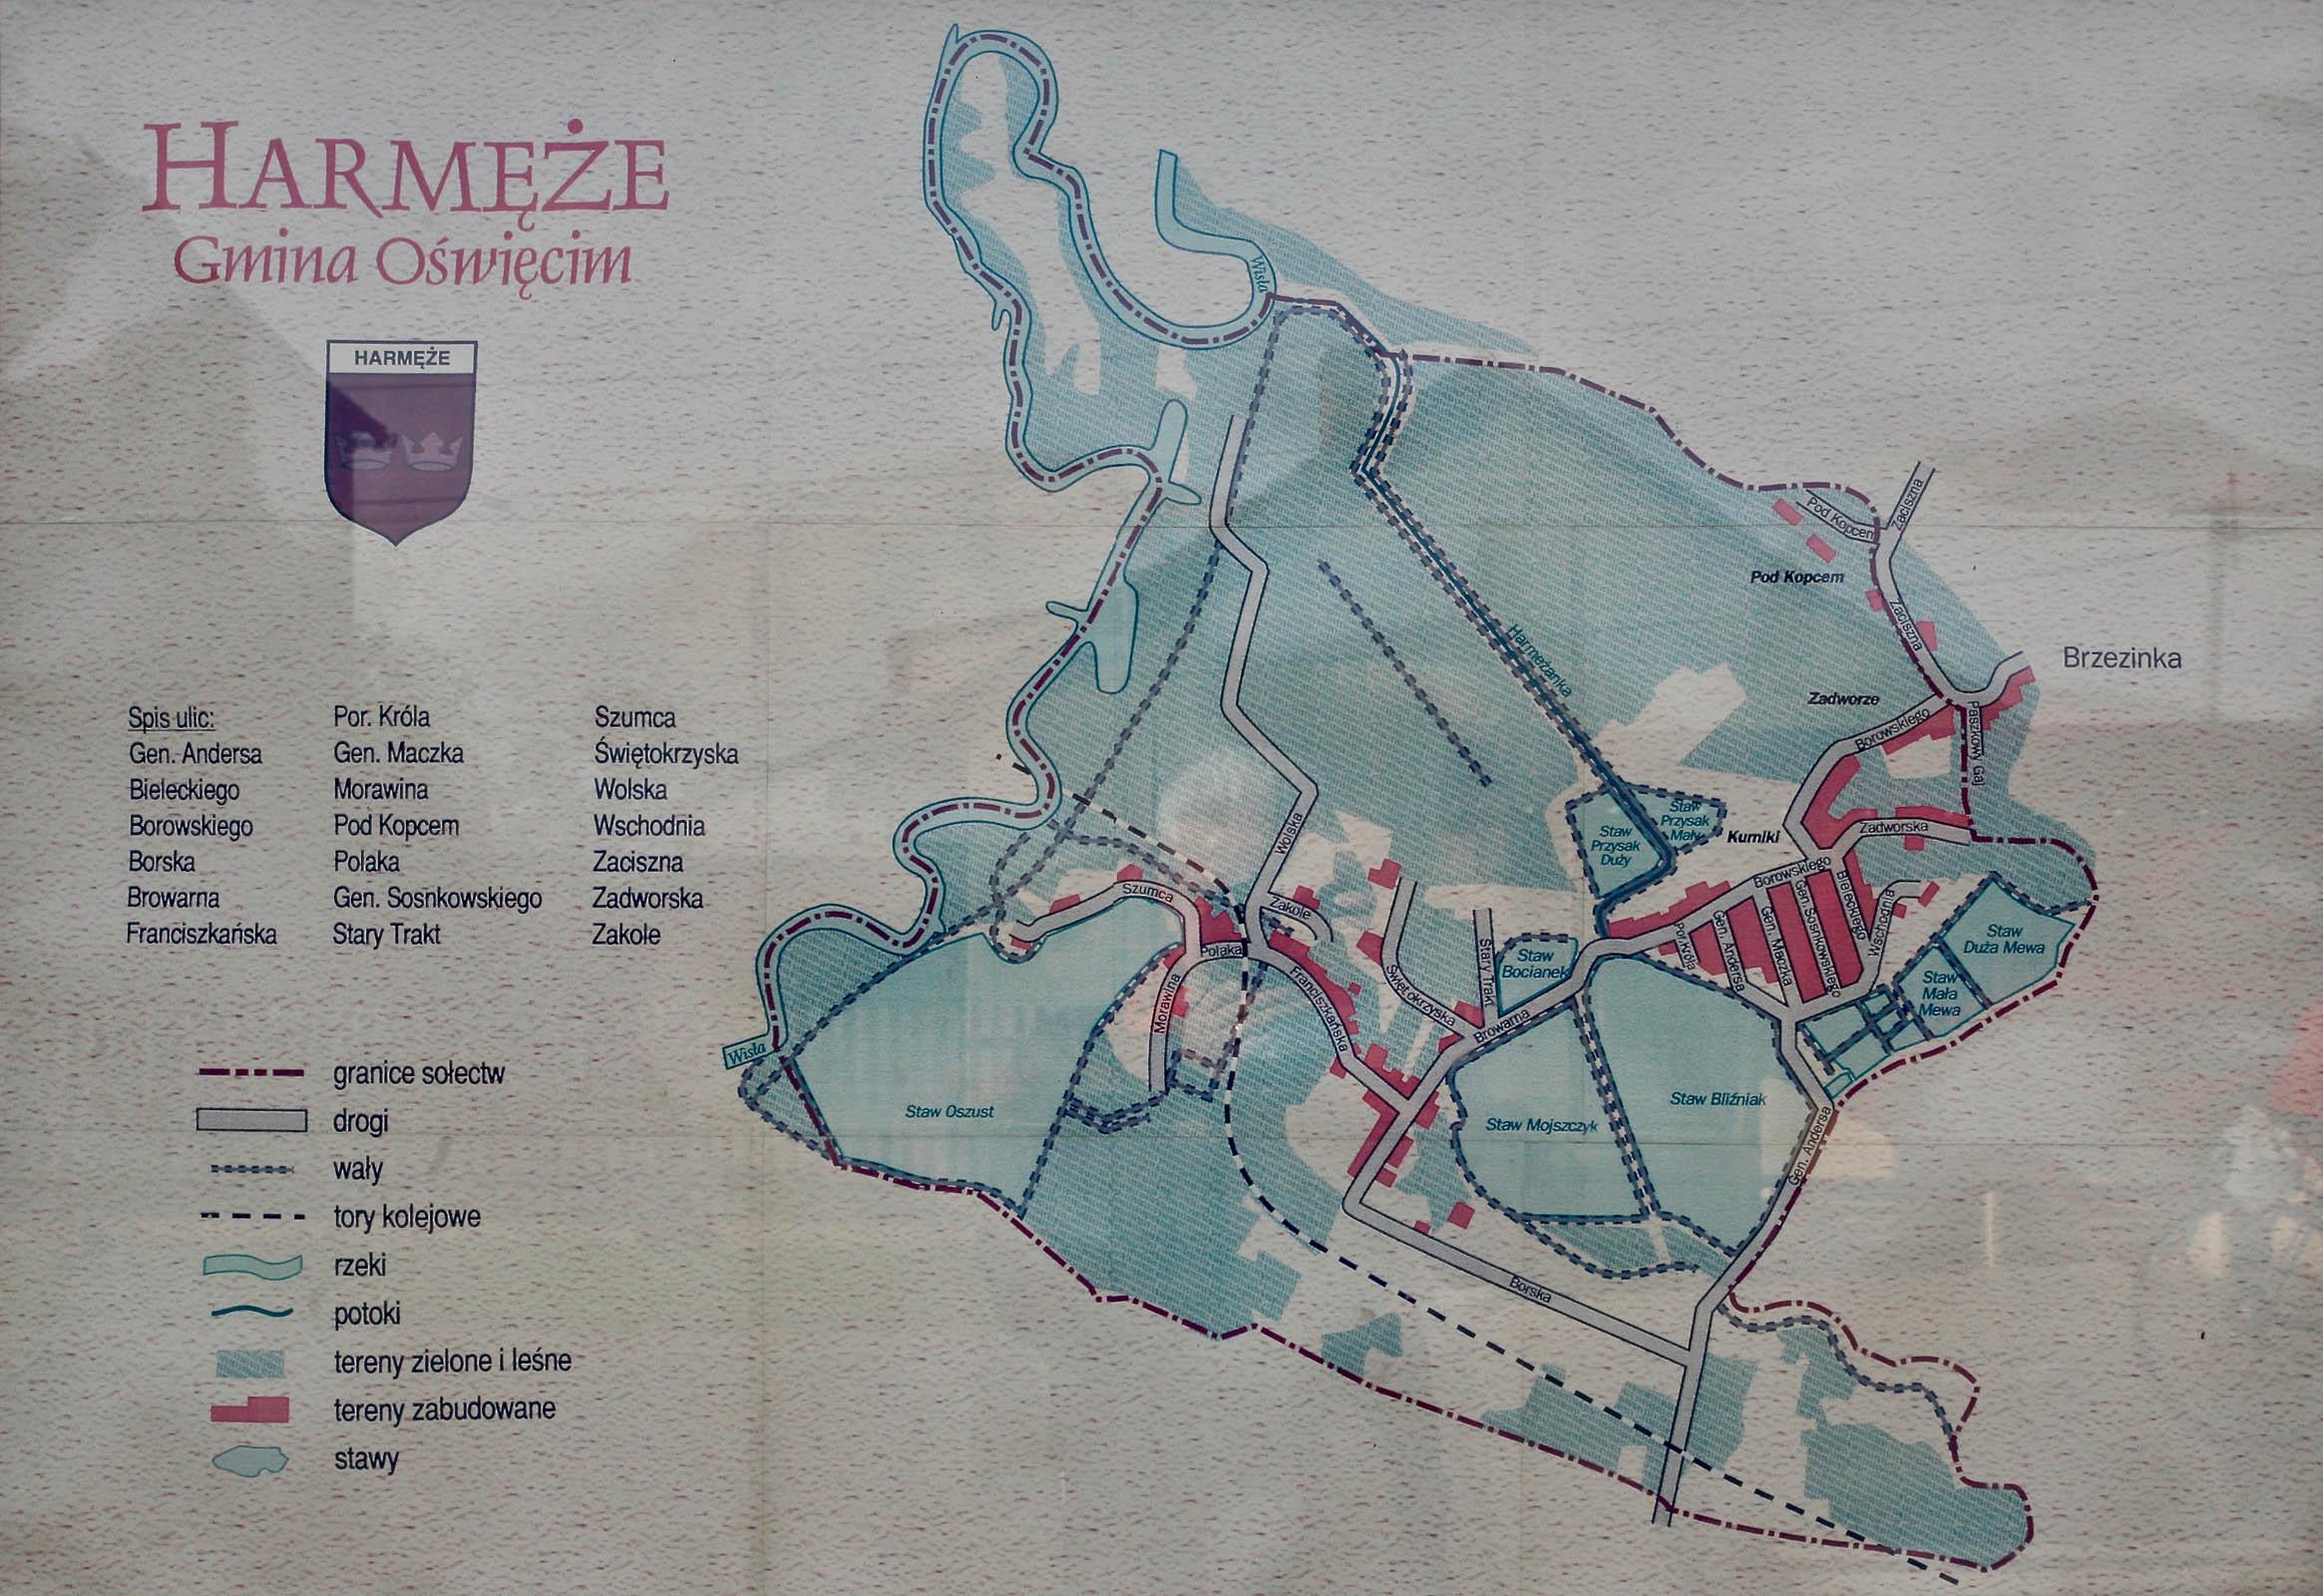 Map of Harmeze